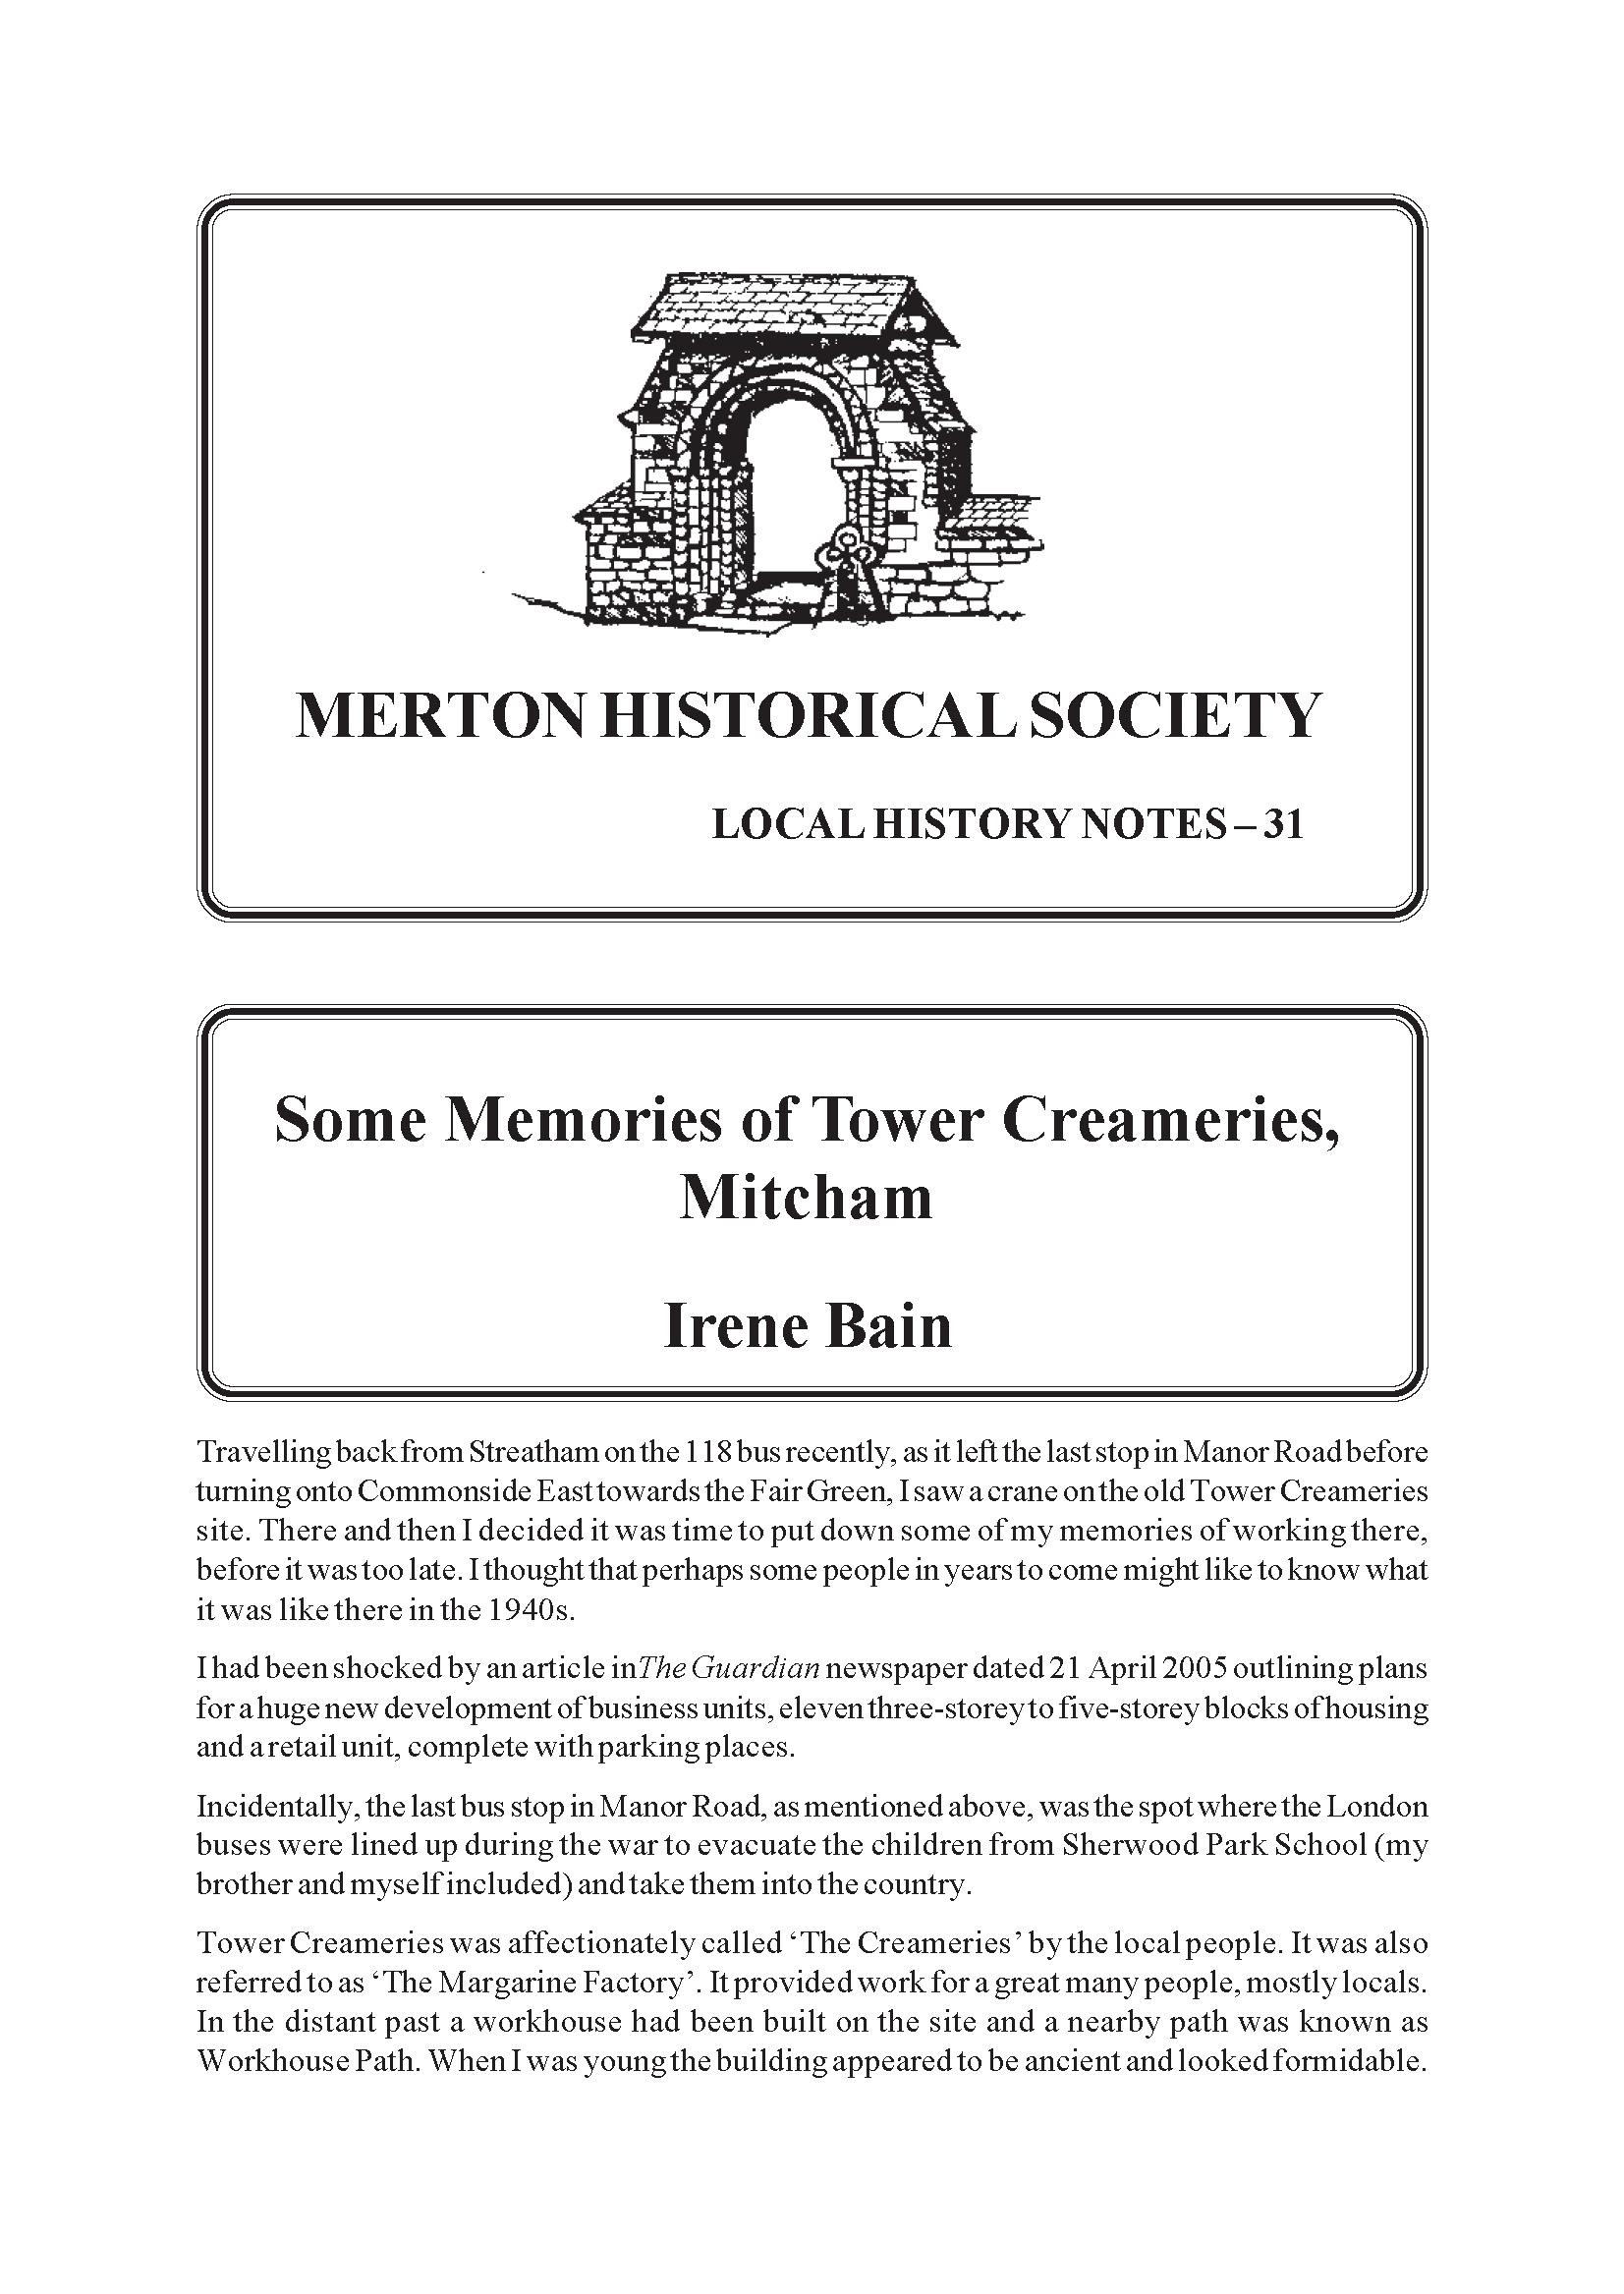 Some Memories Of Tower Creameries Mitcham Merton Historical Society